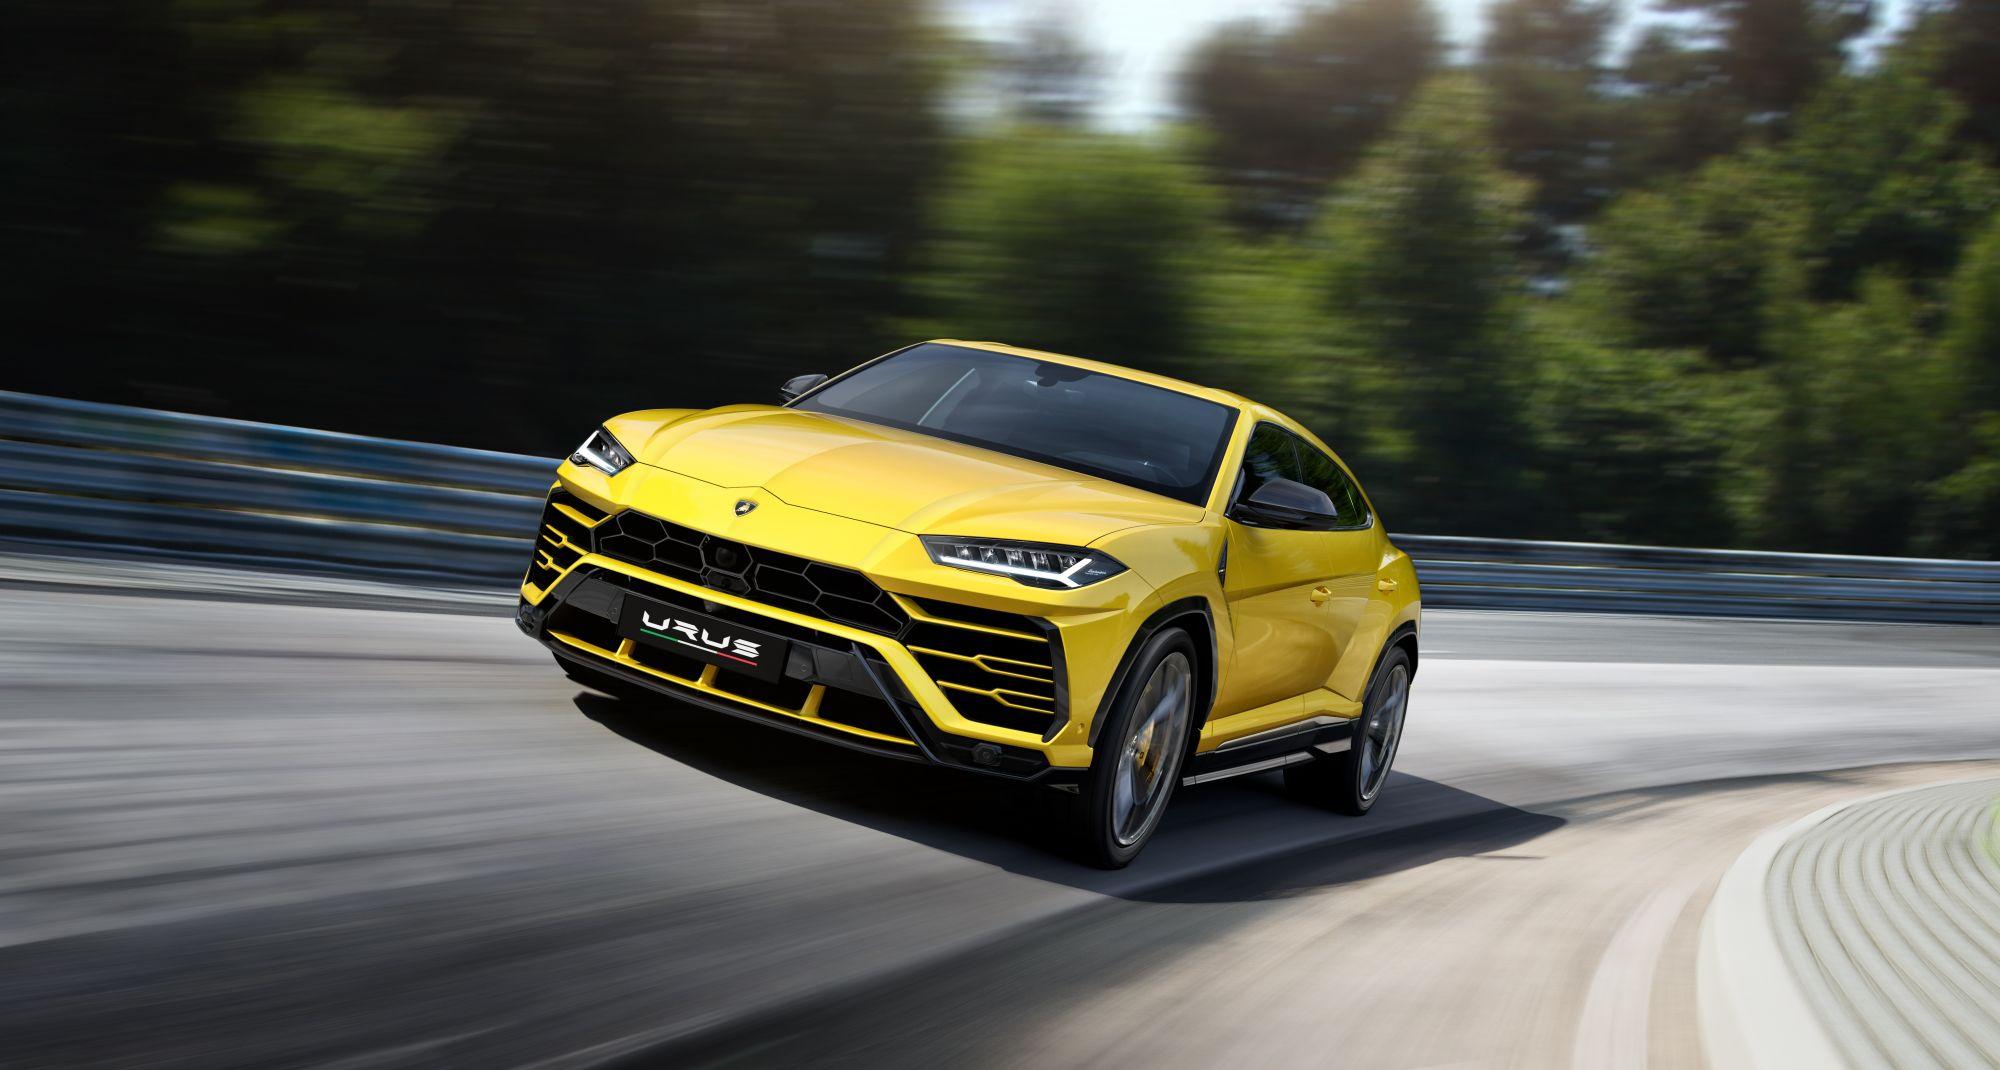 Lamborghini Embraces Hybrid Technology Across The Board